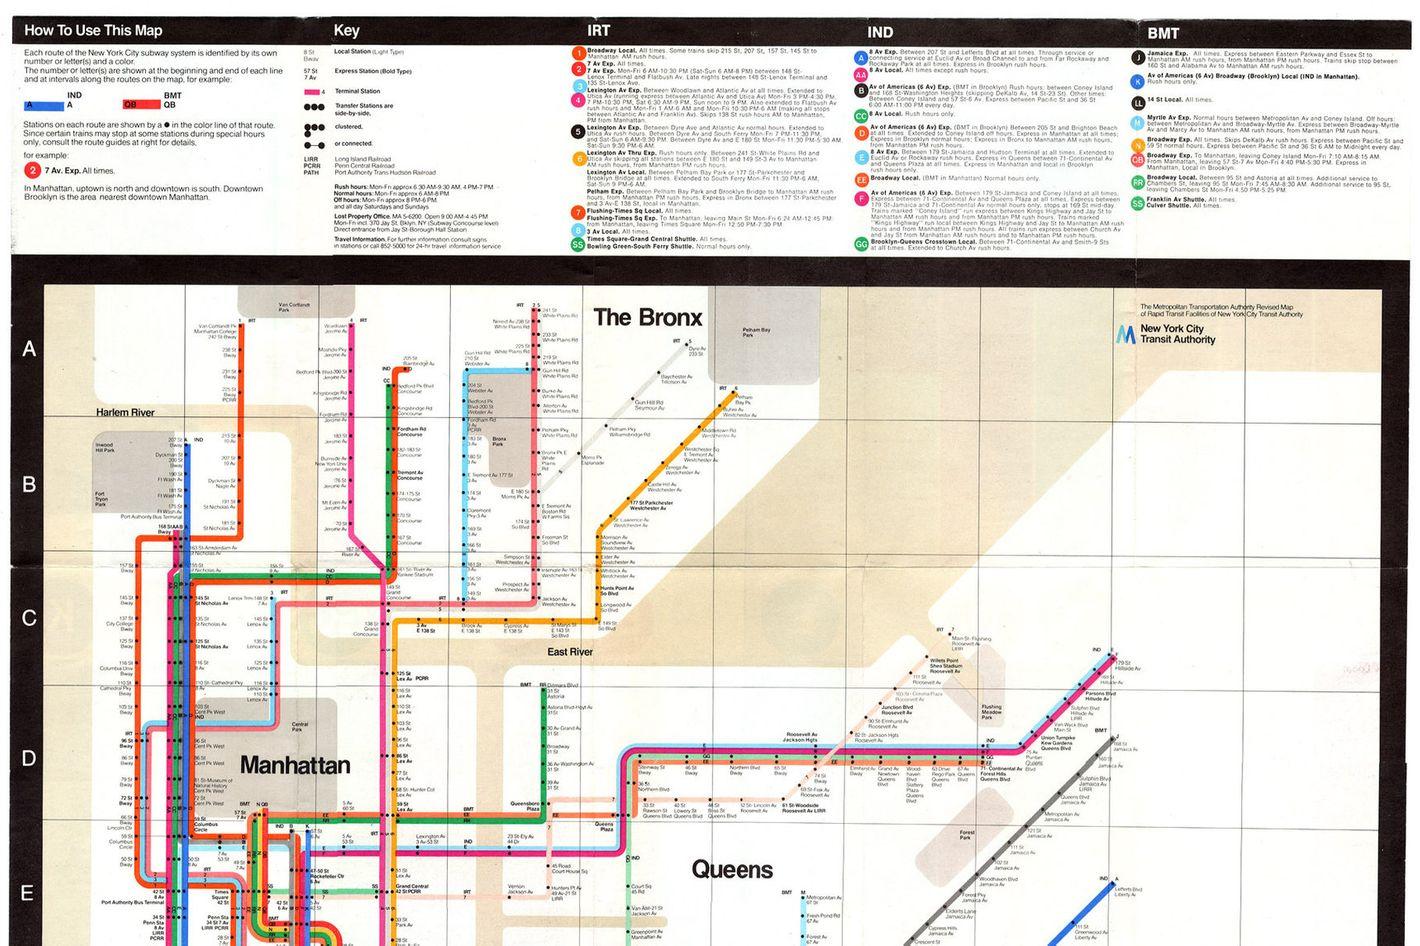 New York Subway Map Vignelli.R I P Massimo Vignelli The Graphic Design Legend Behind The Cult